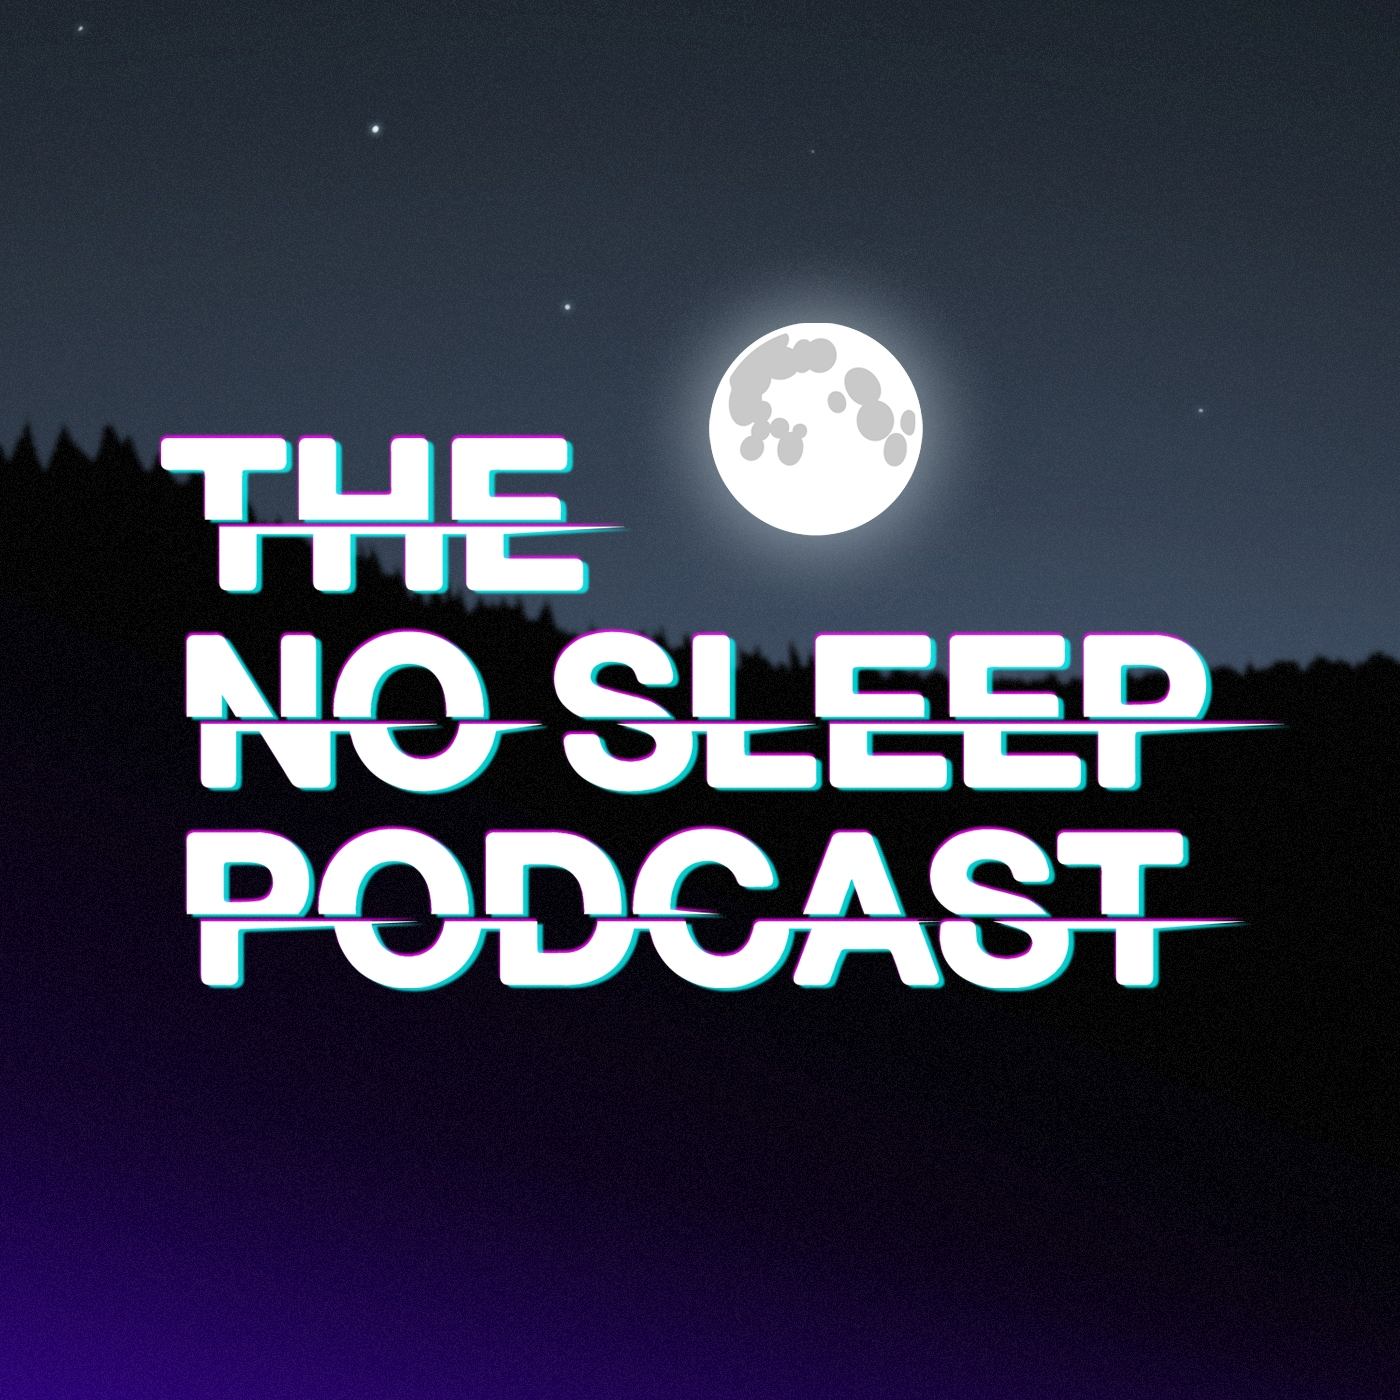 NoSleep.Podcast.S4.Logo_1400 (1).jpg